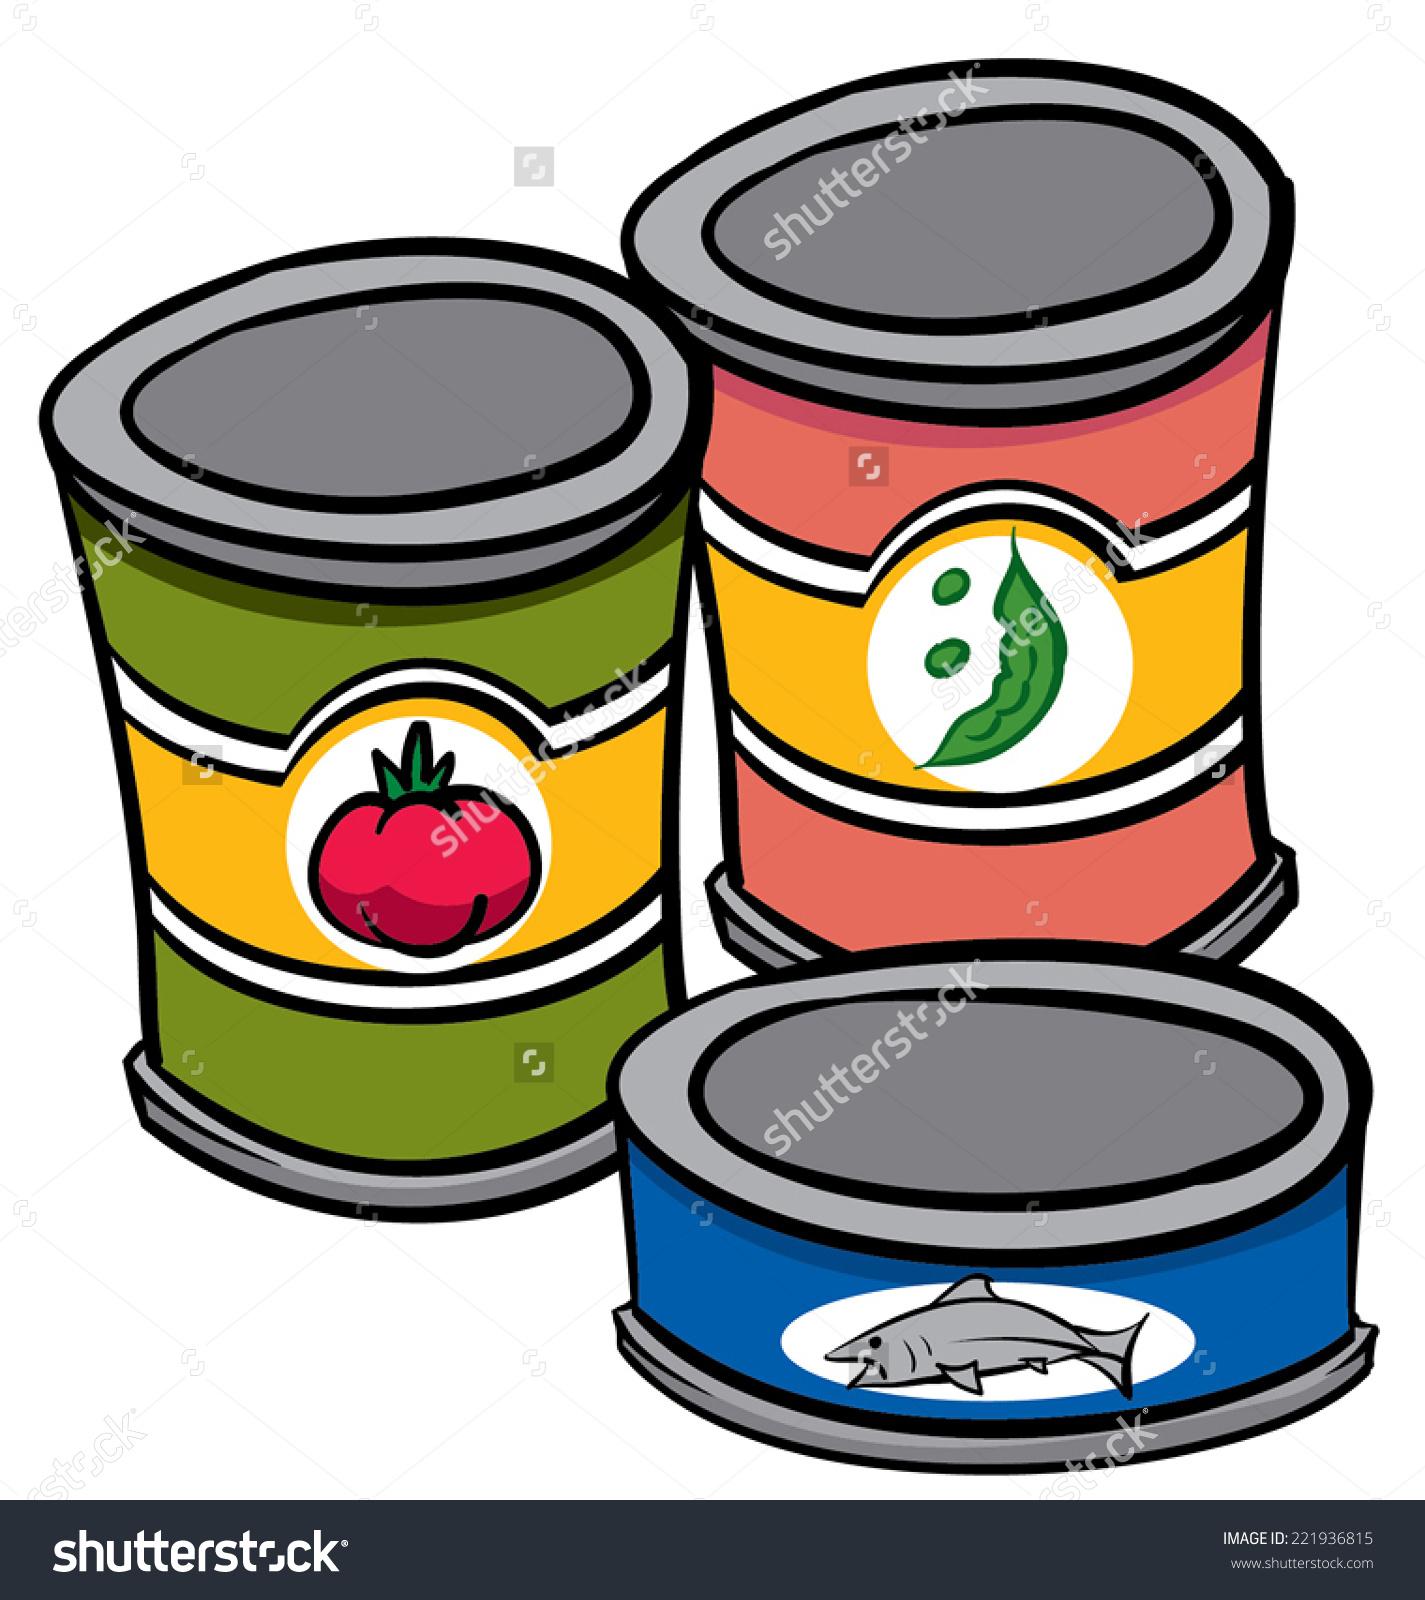 Canned Food Clipart. 52f8c53d723f40b7820-Canned Food Clipart. 52f8c53d723f40b7820390cff6ea26 .-8